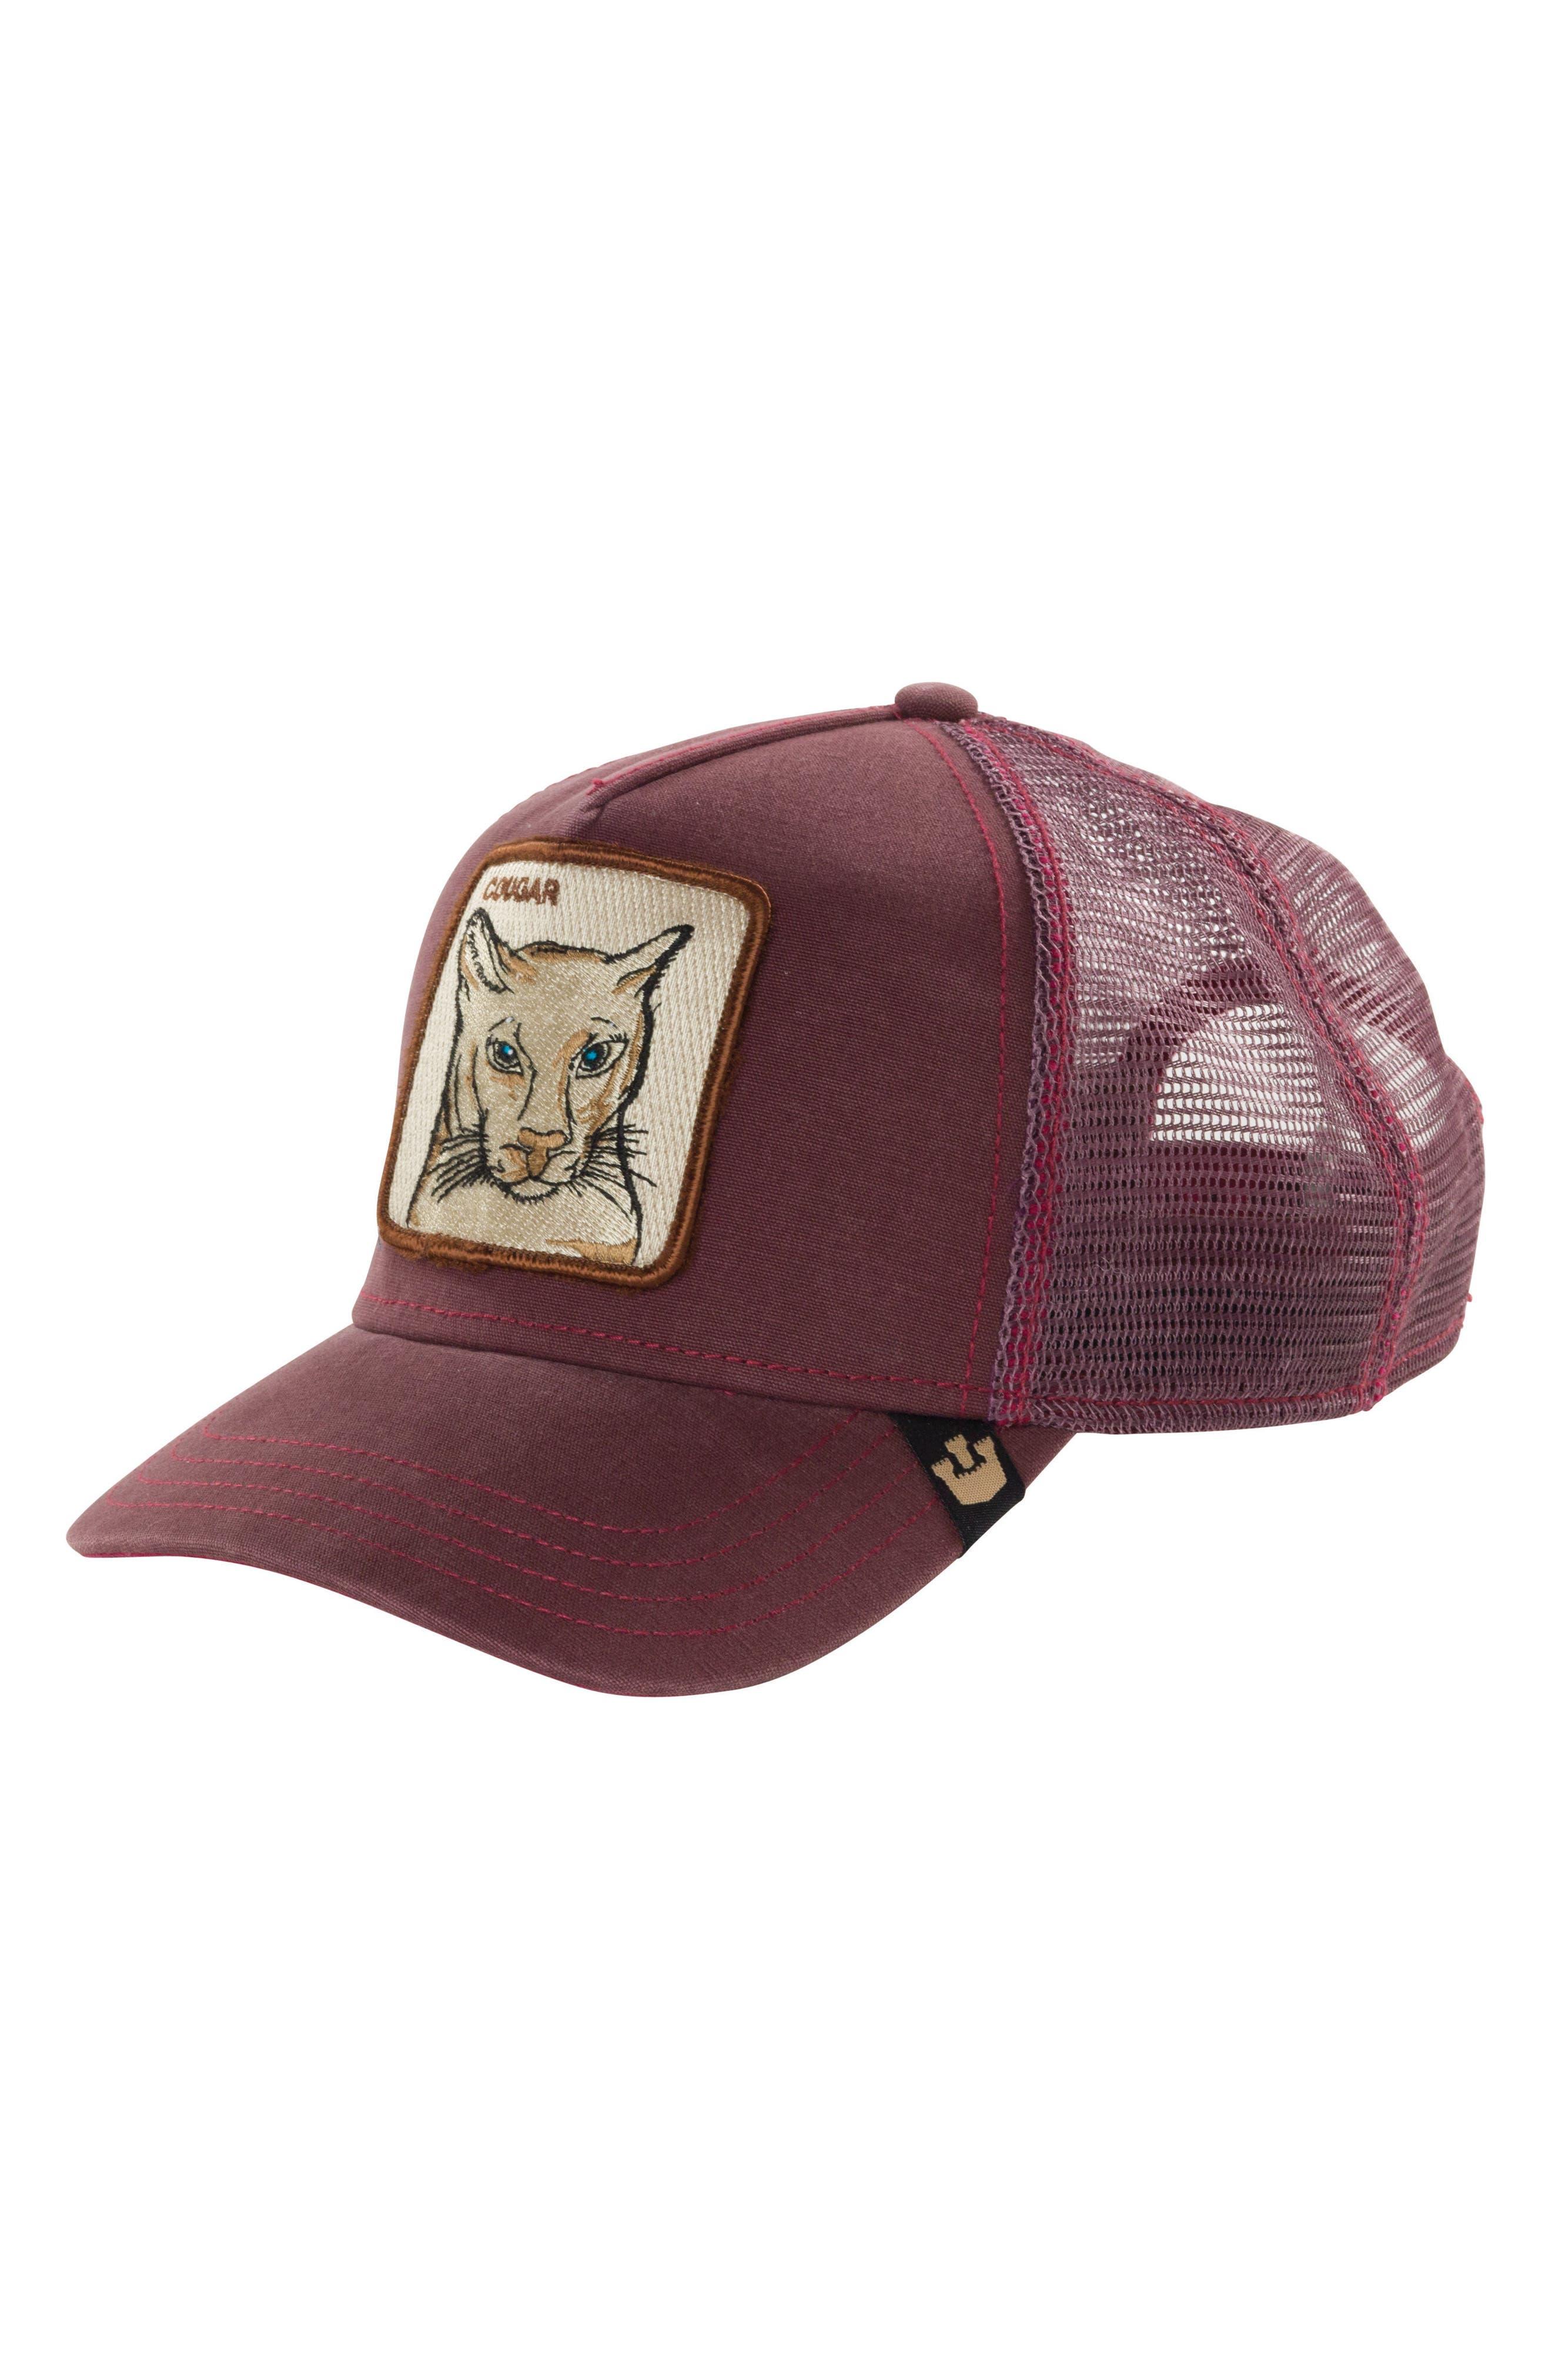 Goorin Brothers 'Animal Farm - Cougar' Trucker Hat